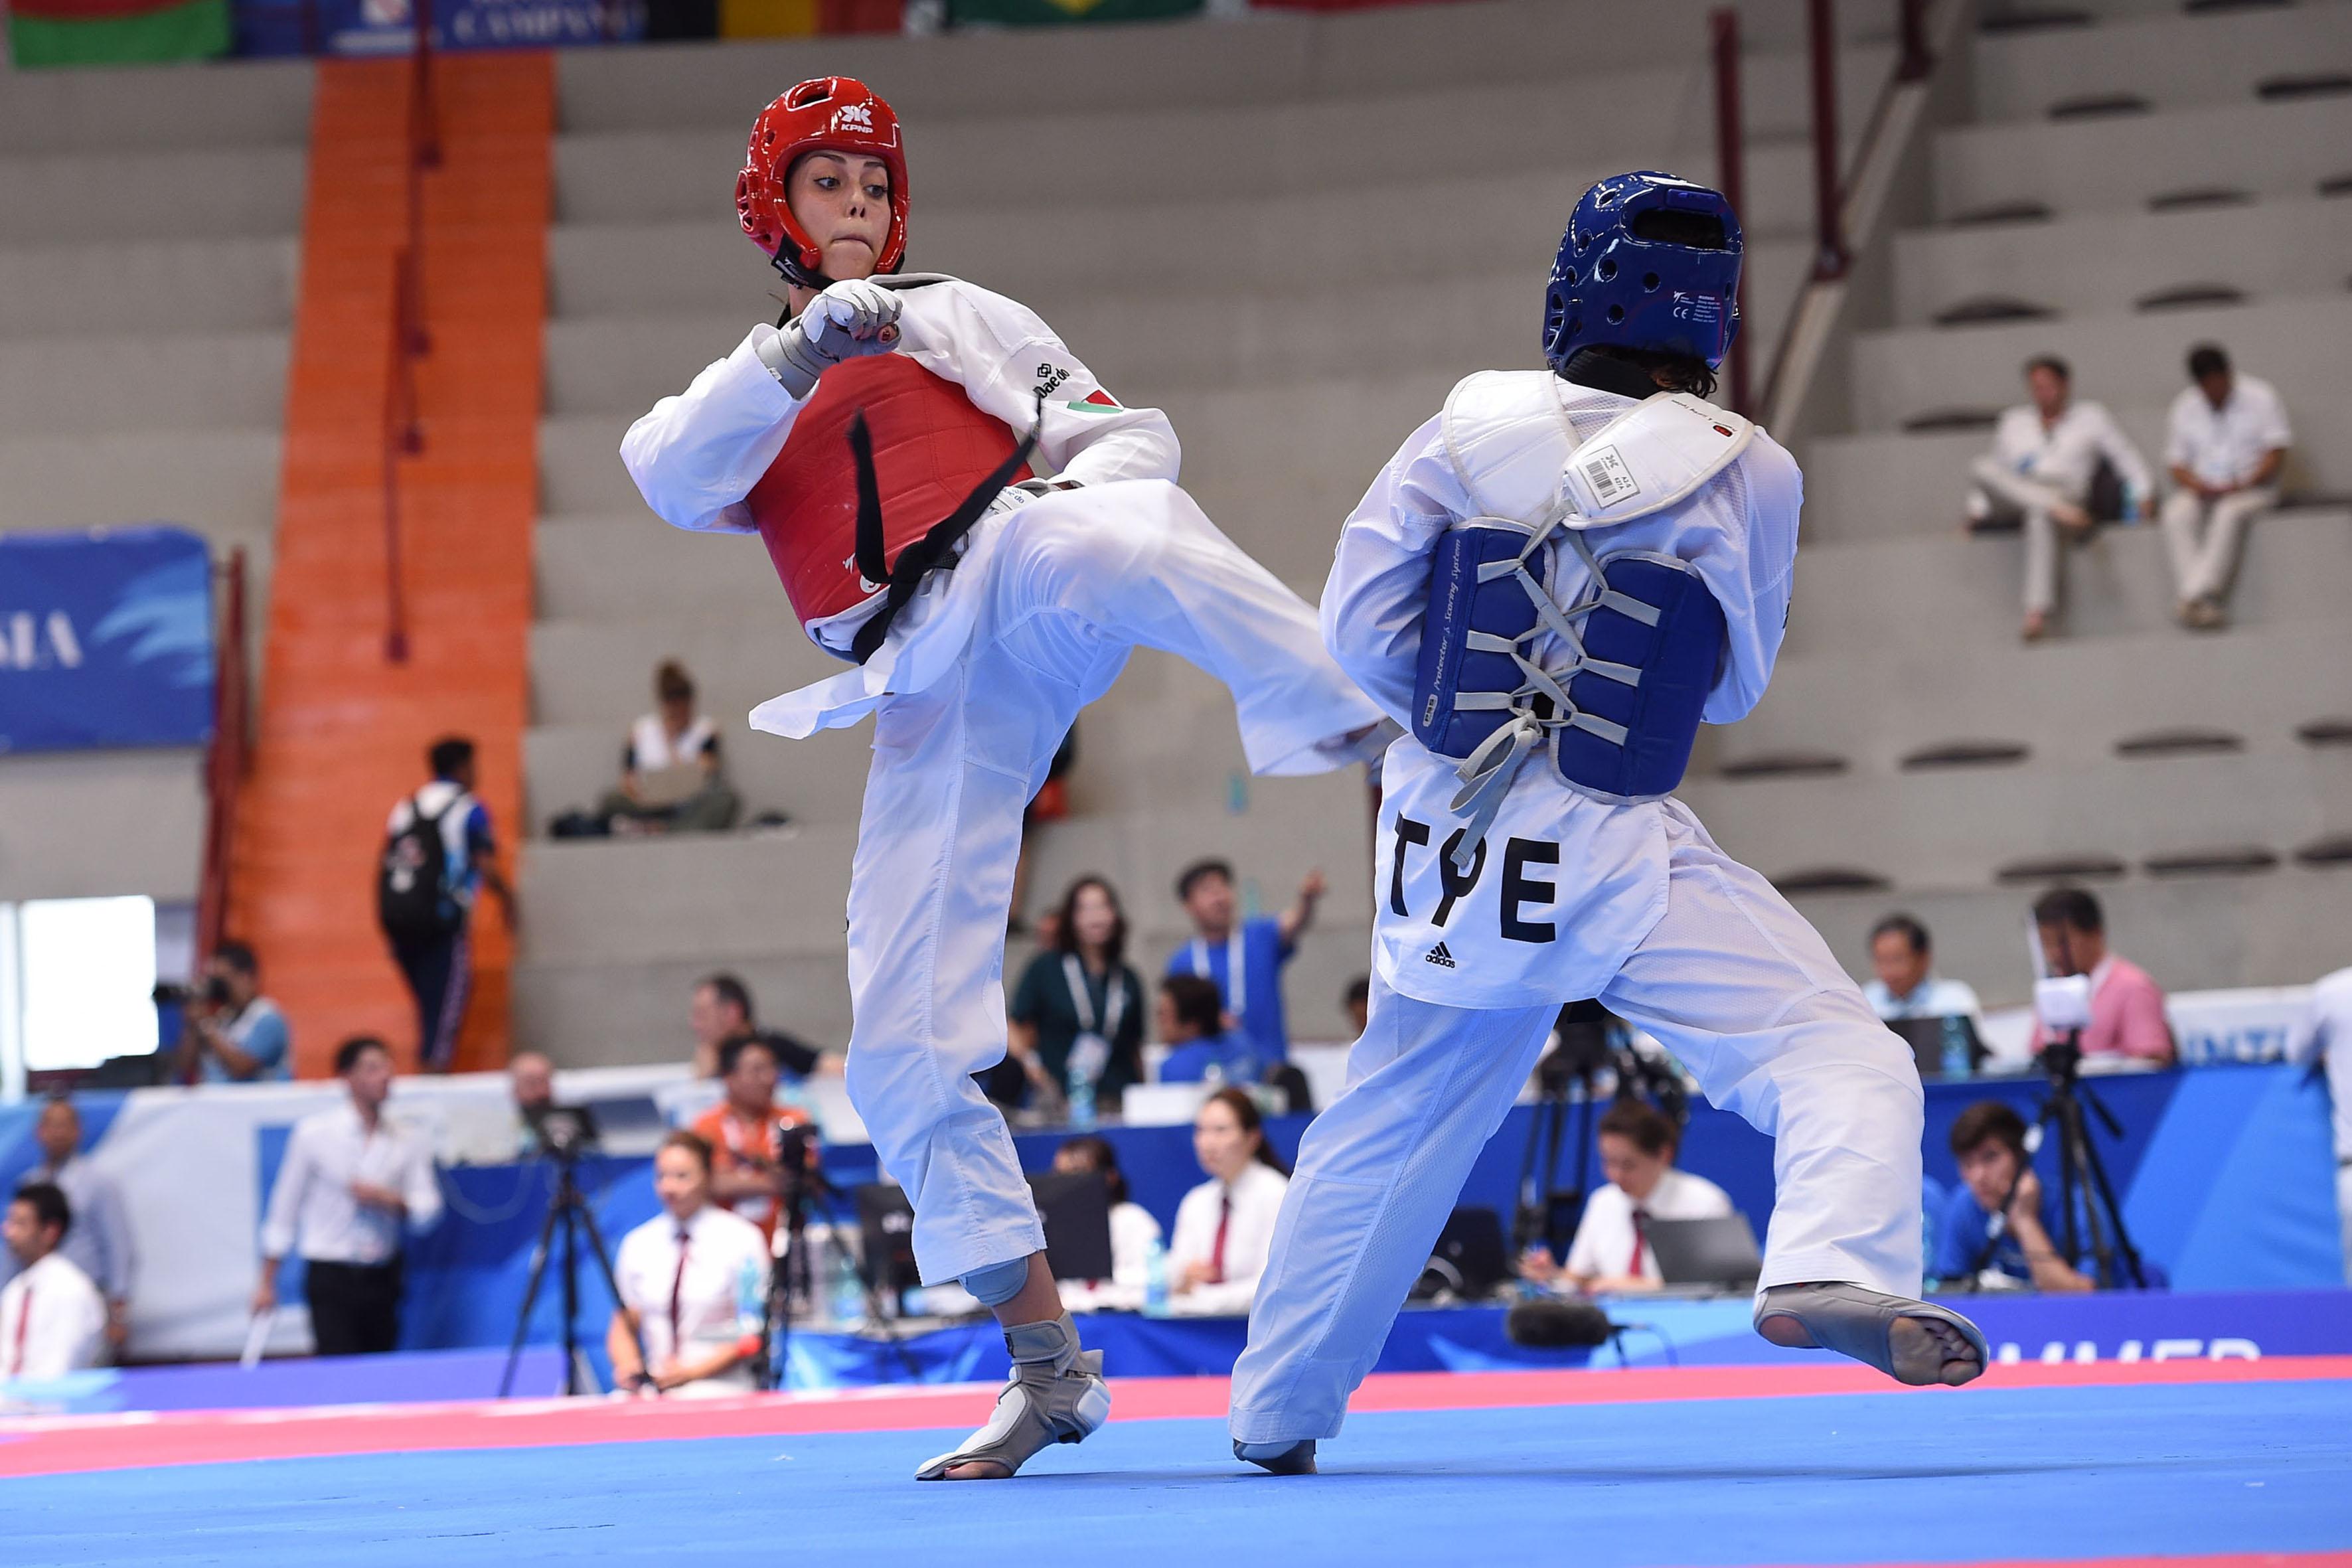 Taekwondo - 10-07-2019 ROTOLO DANIELA